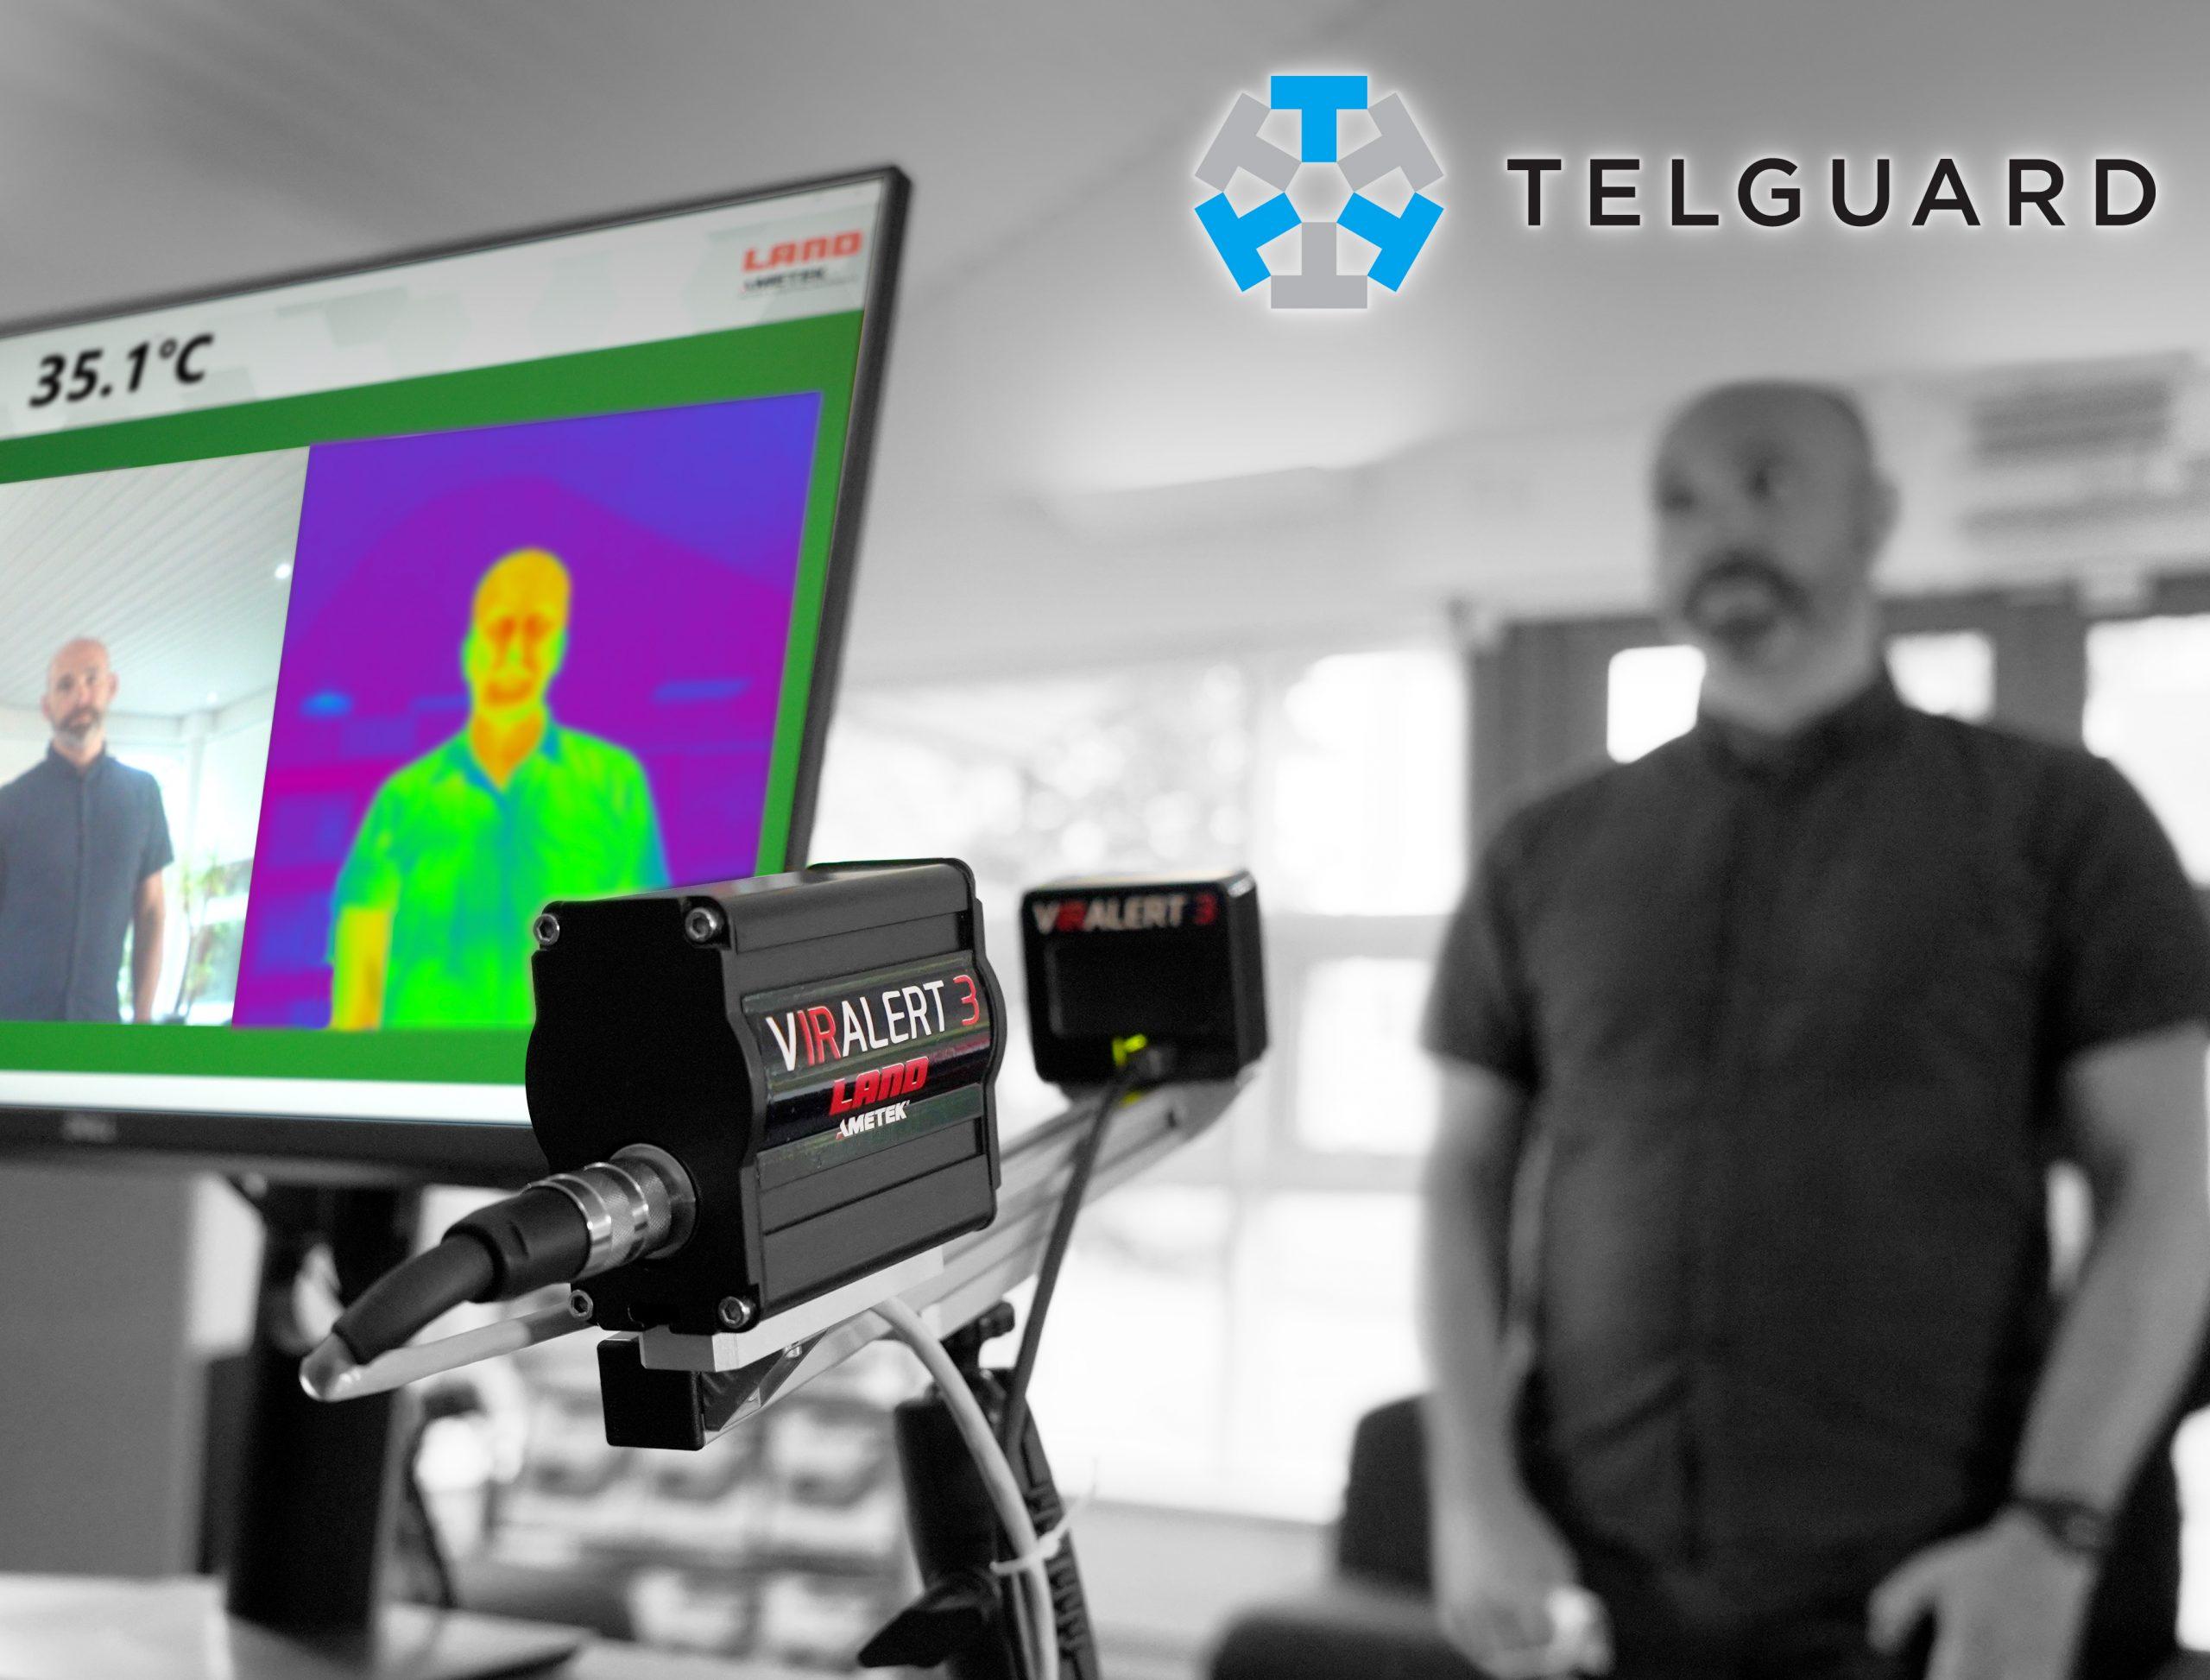 Telguard Offers Human Body Temperature Screening System